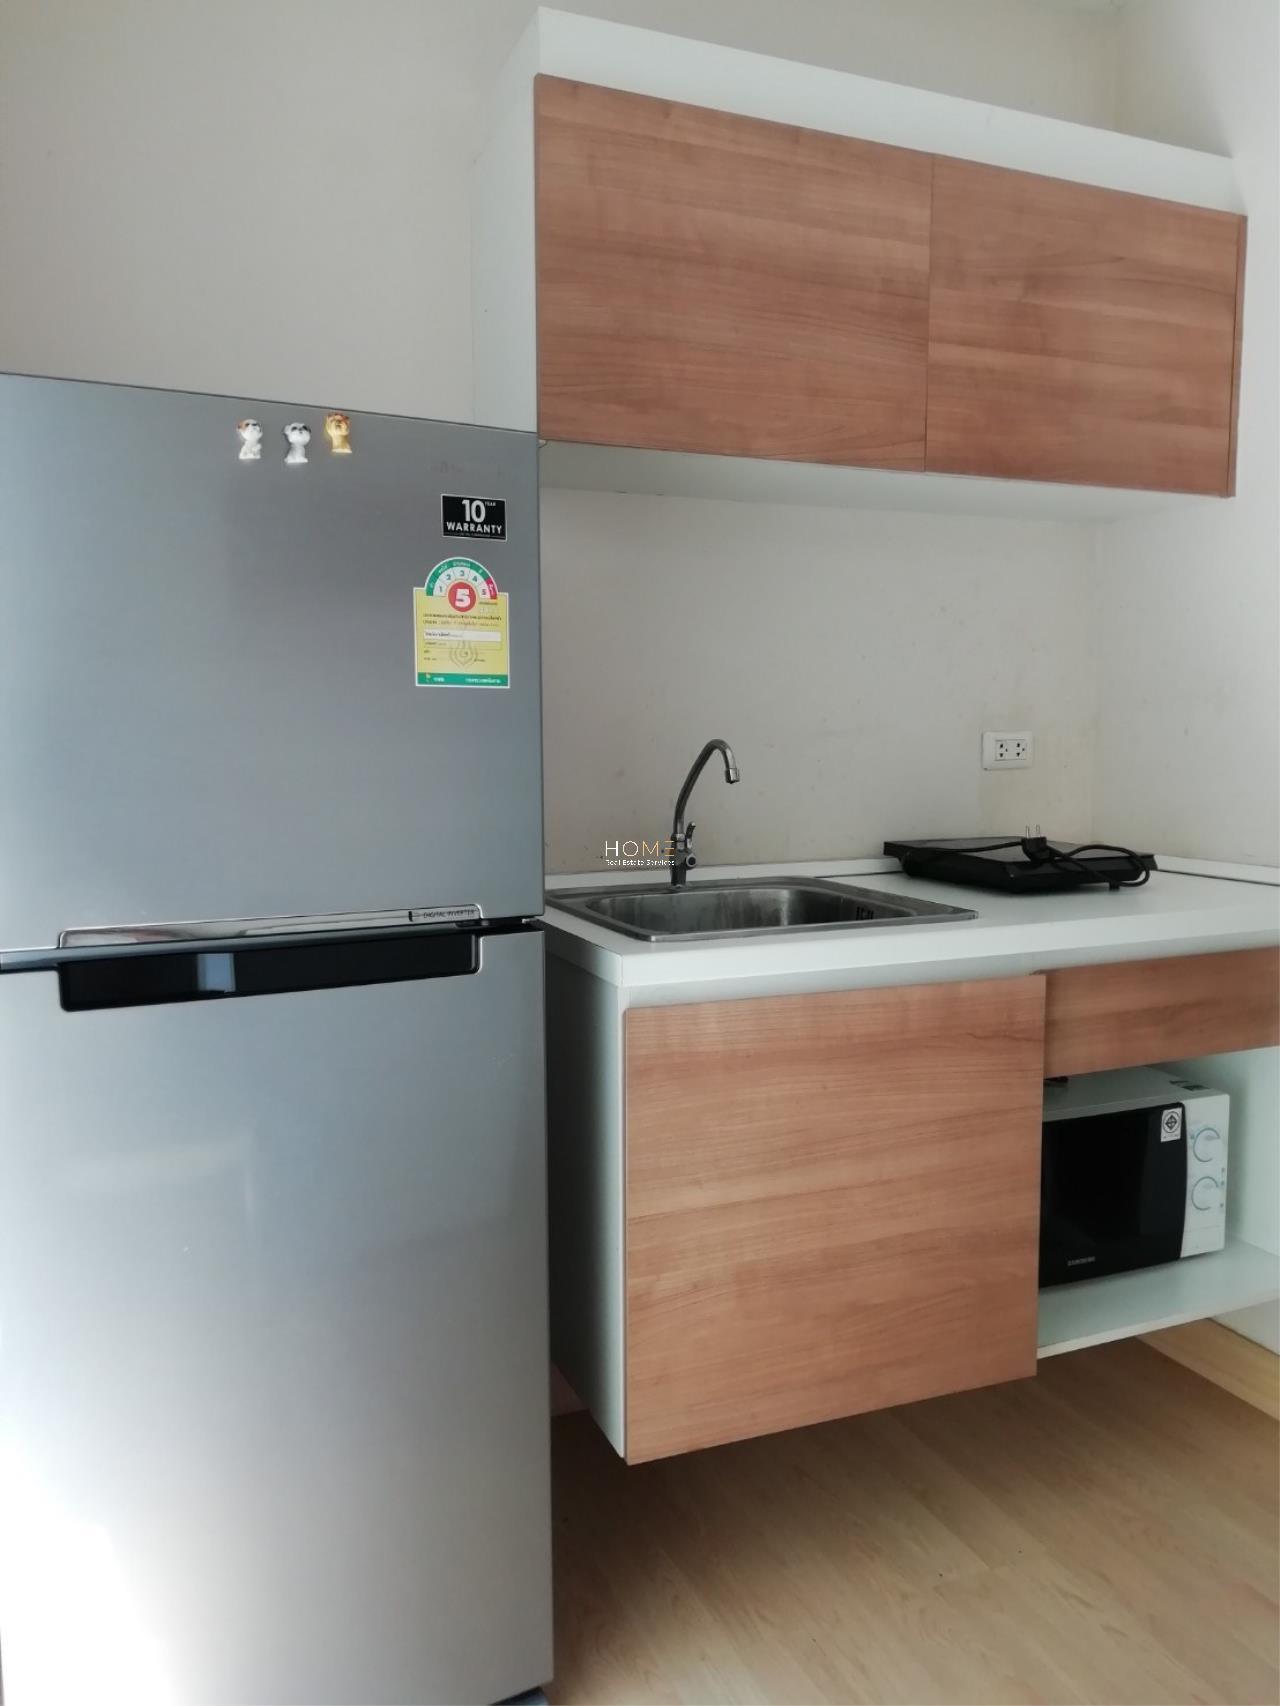 HOME - Real Estate Services Agency's Emerald Residence Ratchada / 1 Bed (FOR SALE & RENT), เอมเมอรัลด์ เรสซิเดนท์ รัชดา / 1 ห้องนอน (ขายและให้เช่า) Nub045 9